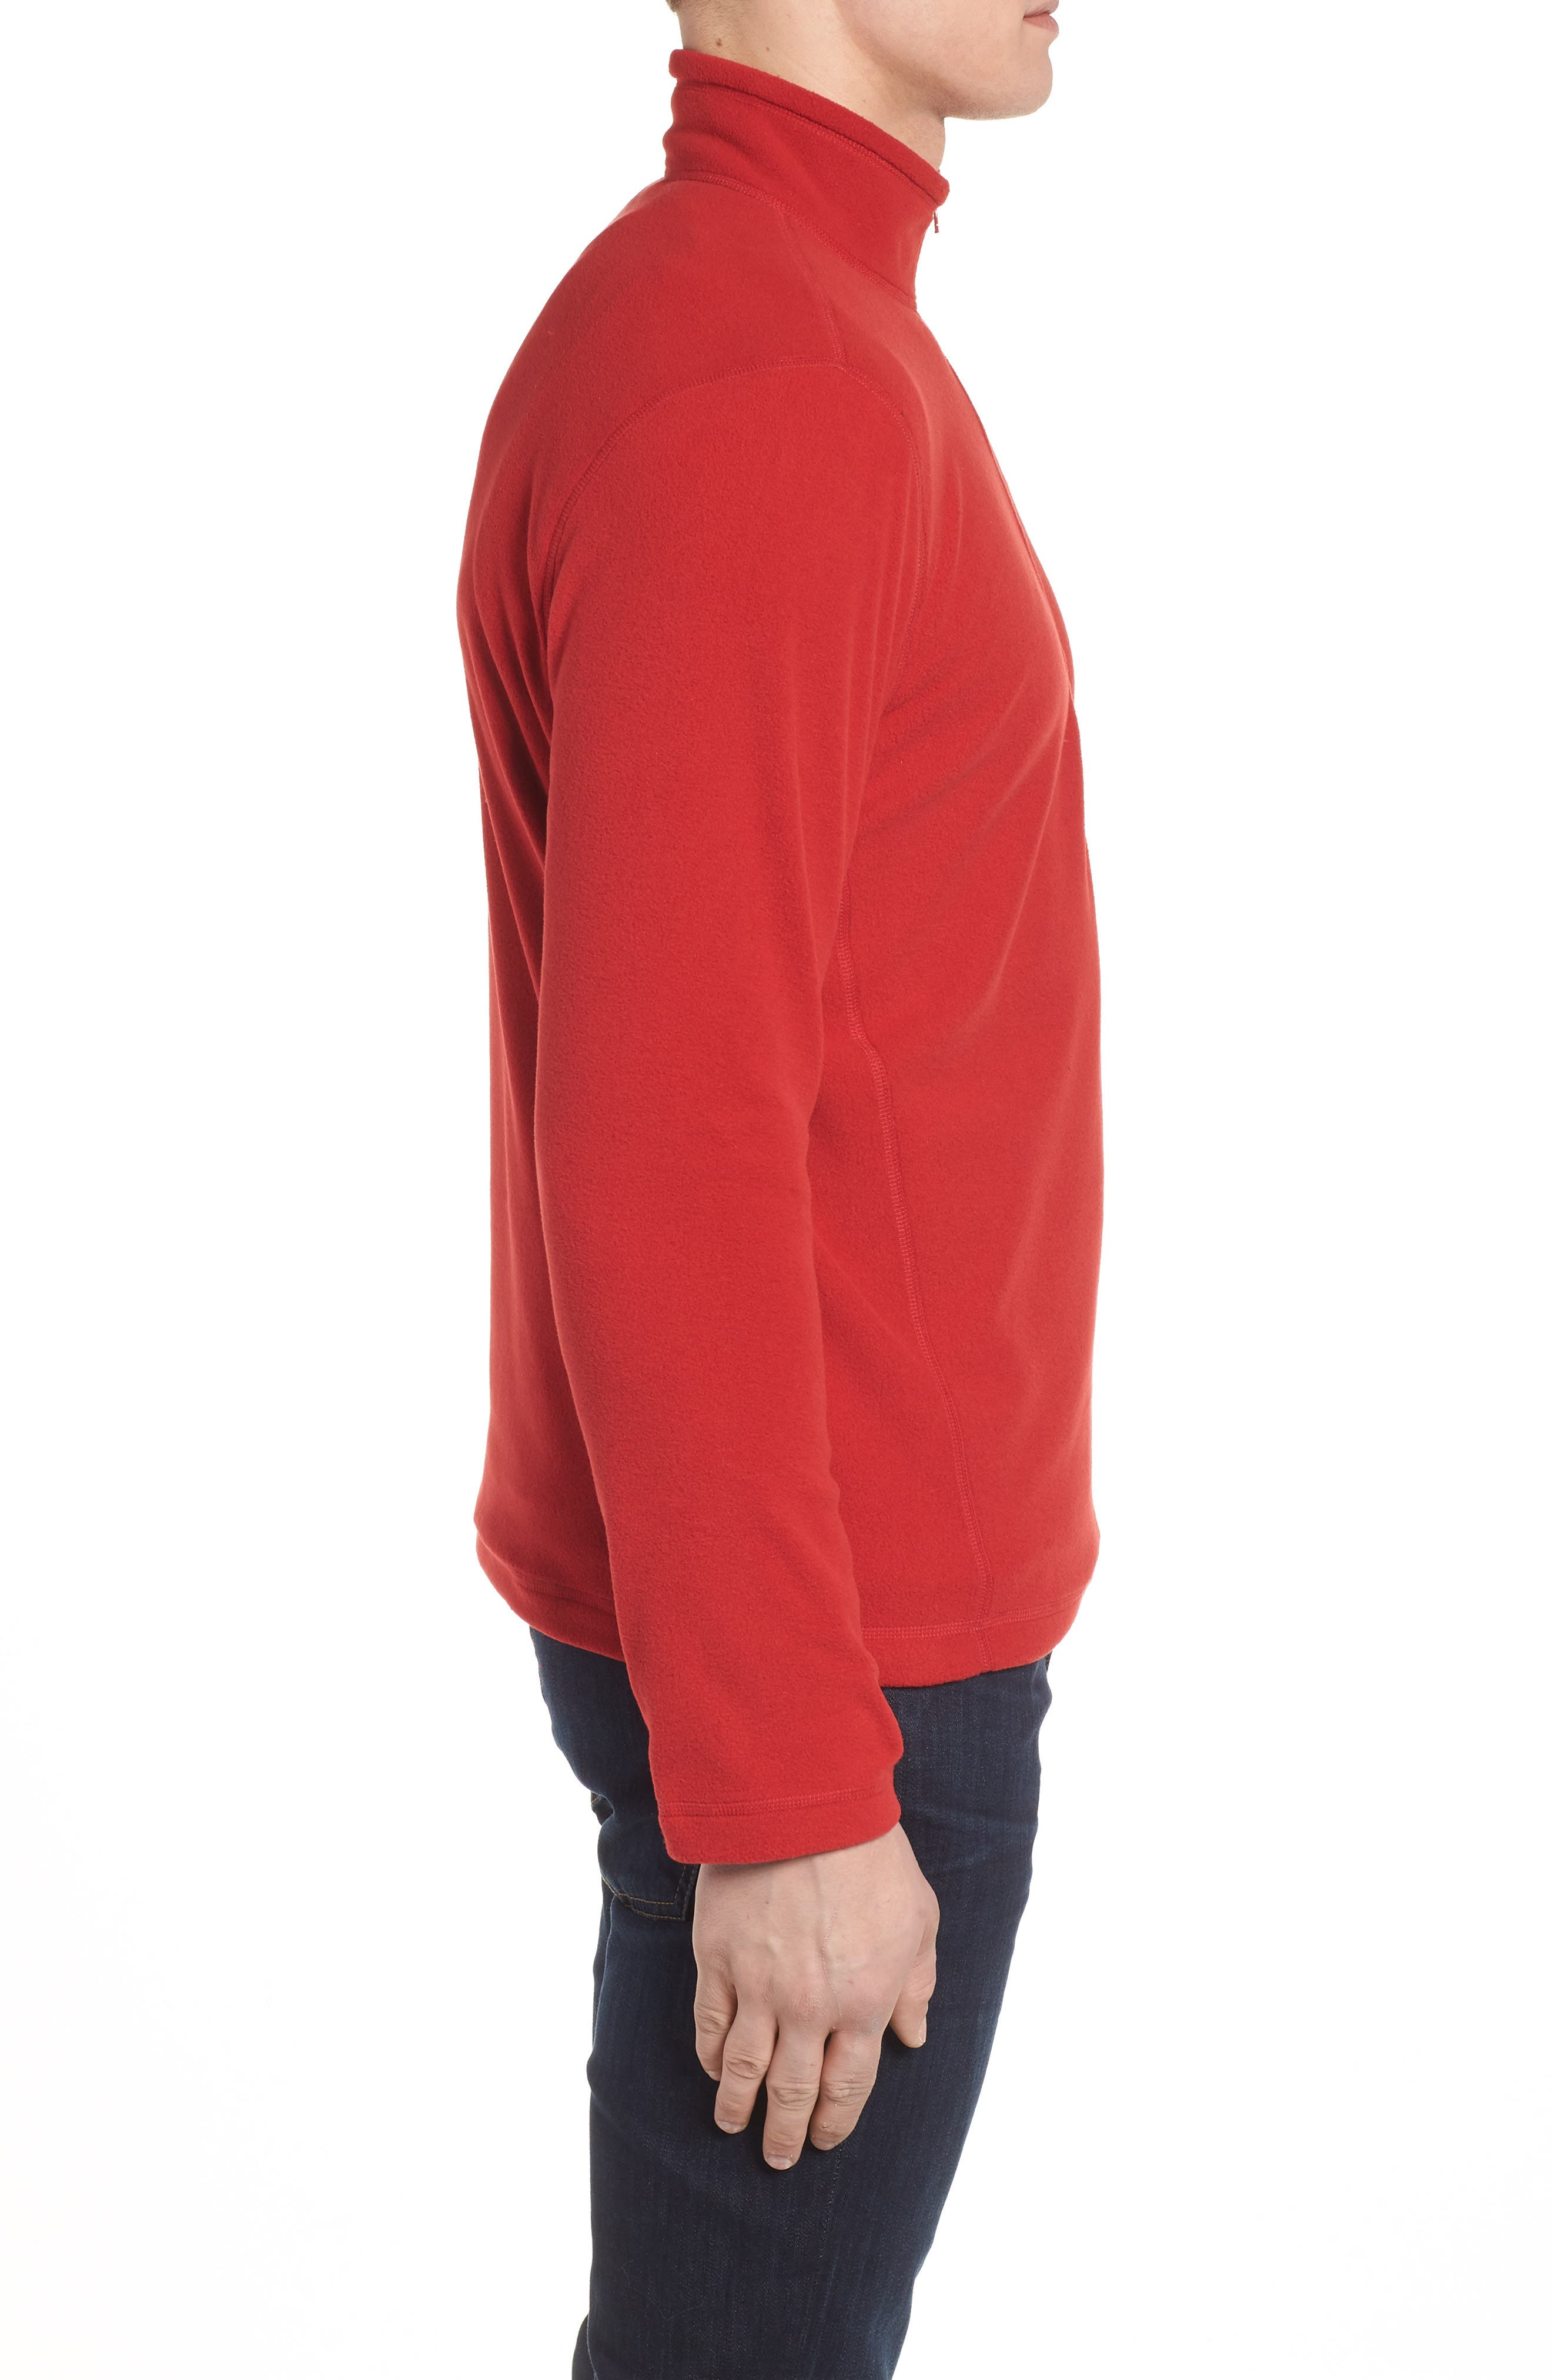 'TKA 100 Glacier' Quarter Zip Fleece Pullover,                             Alternate thumbnail 3, color,                             RAGE RED/ RAGE RED